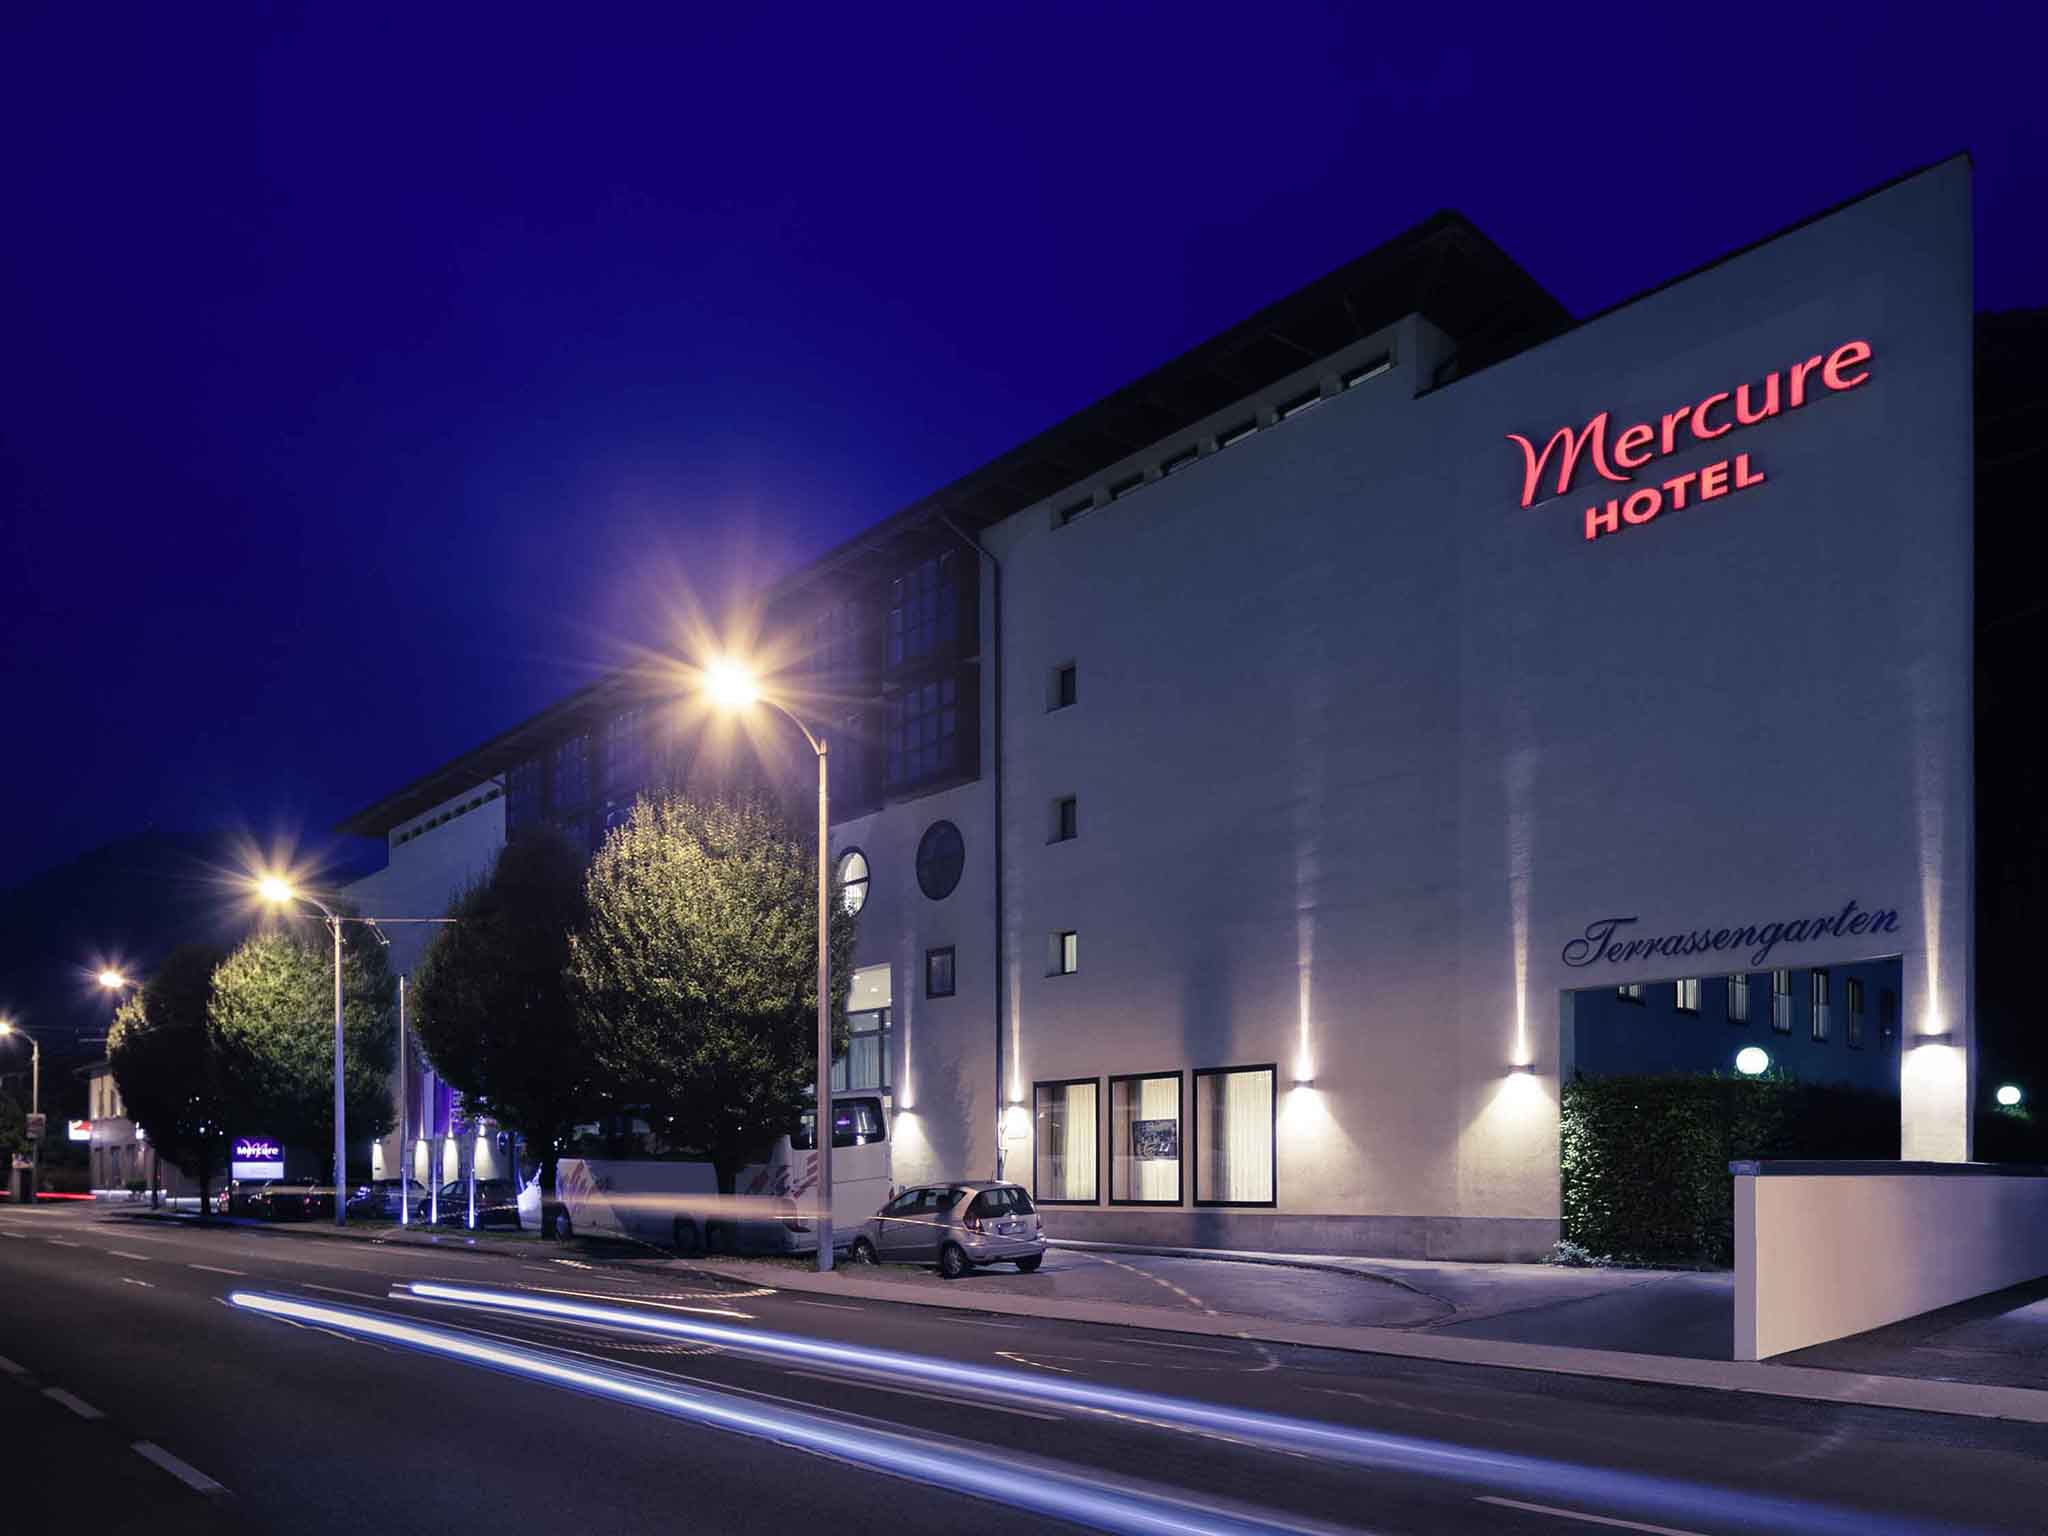 Hotel - Hotel Mercure Salzburg Central